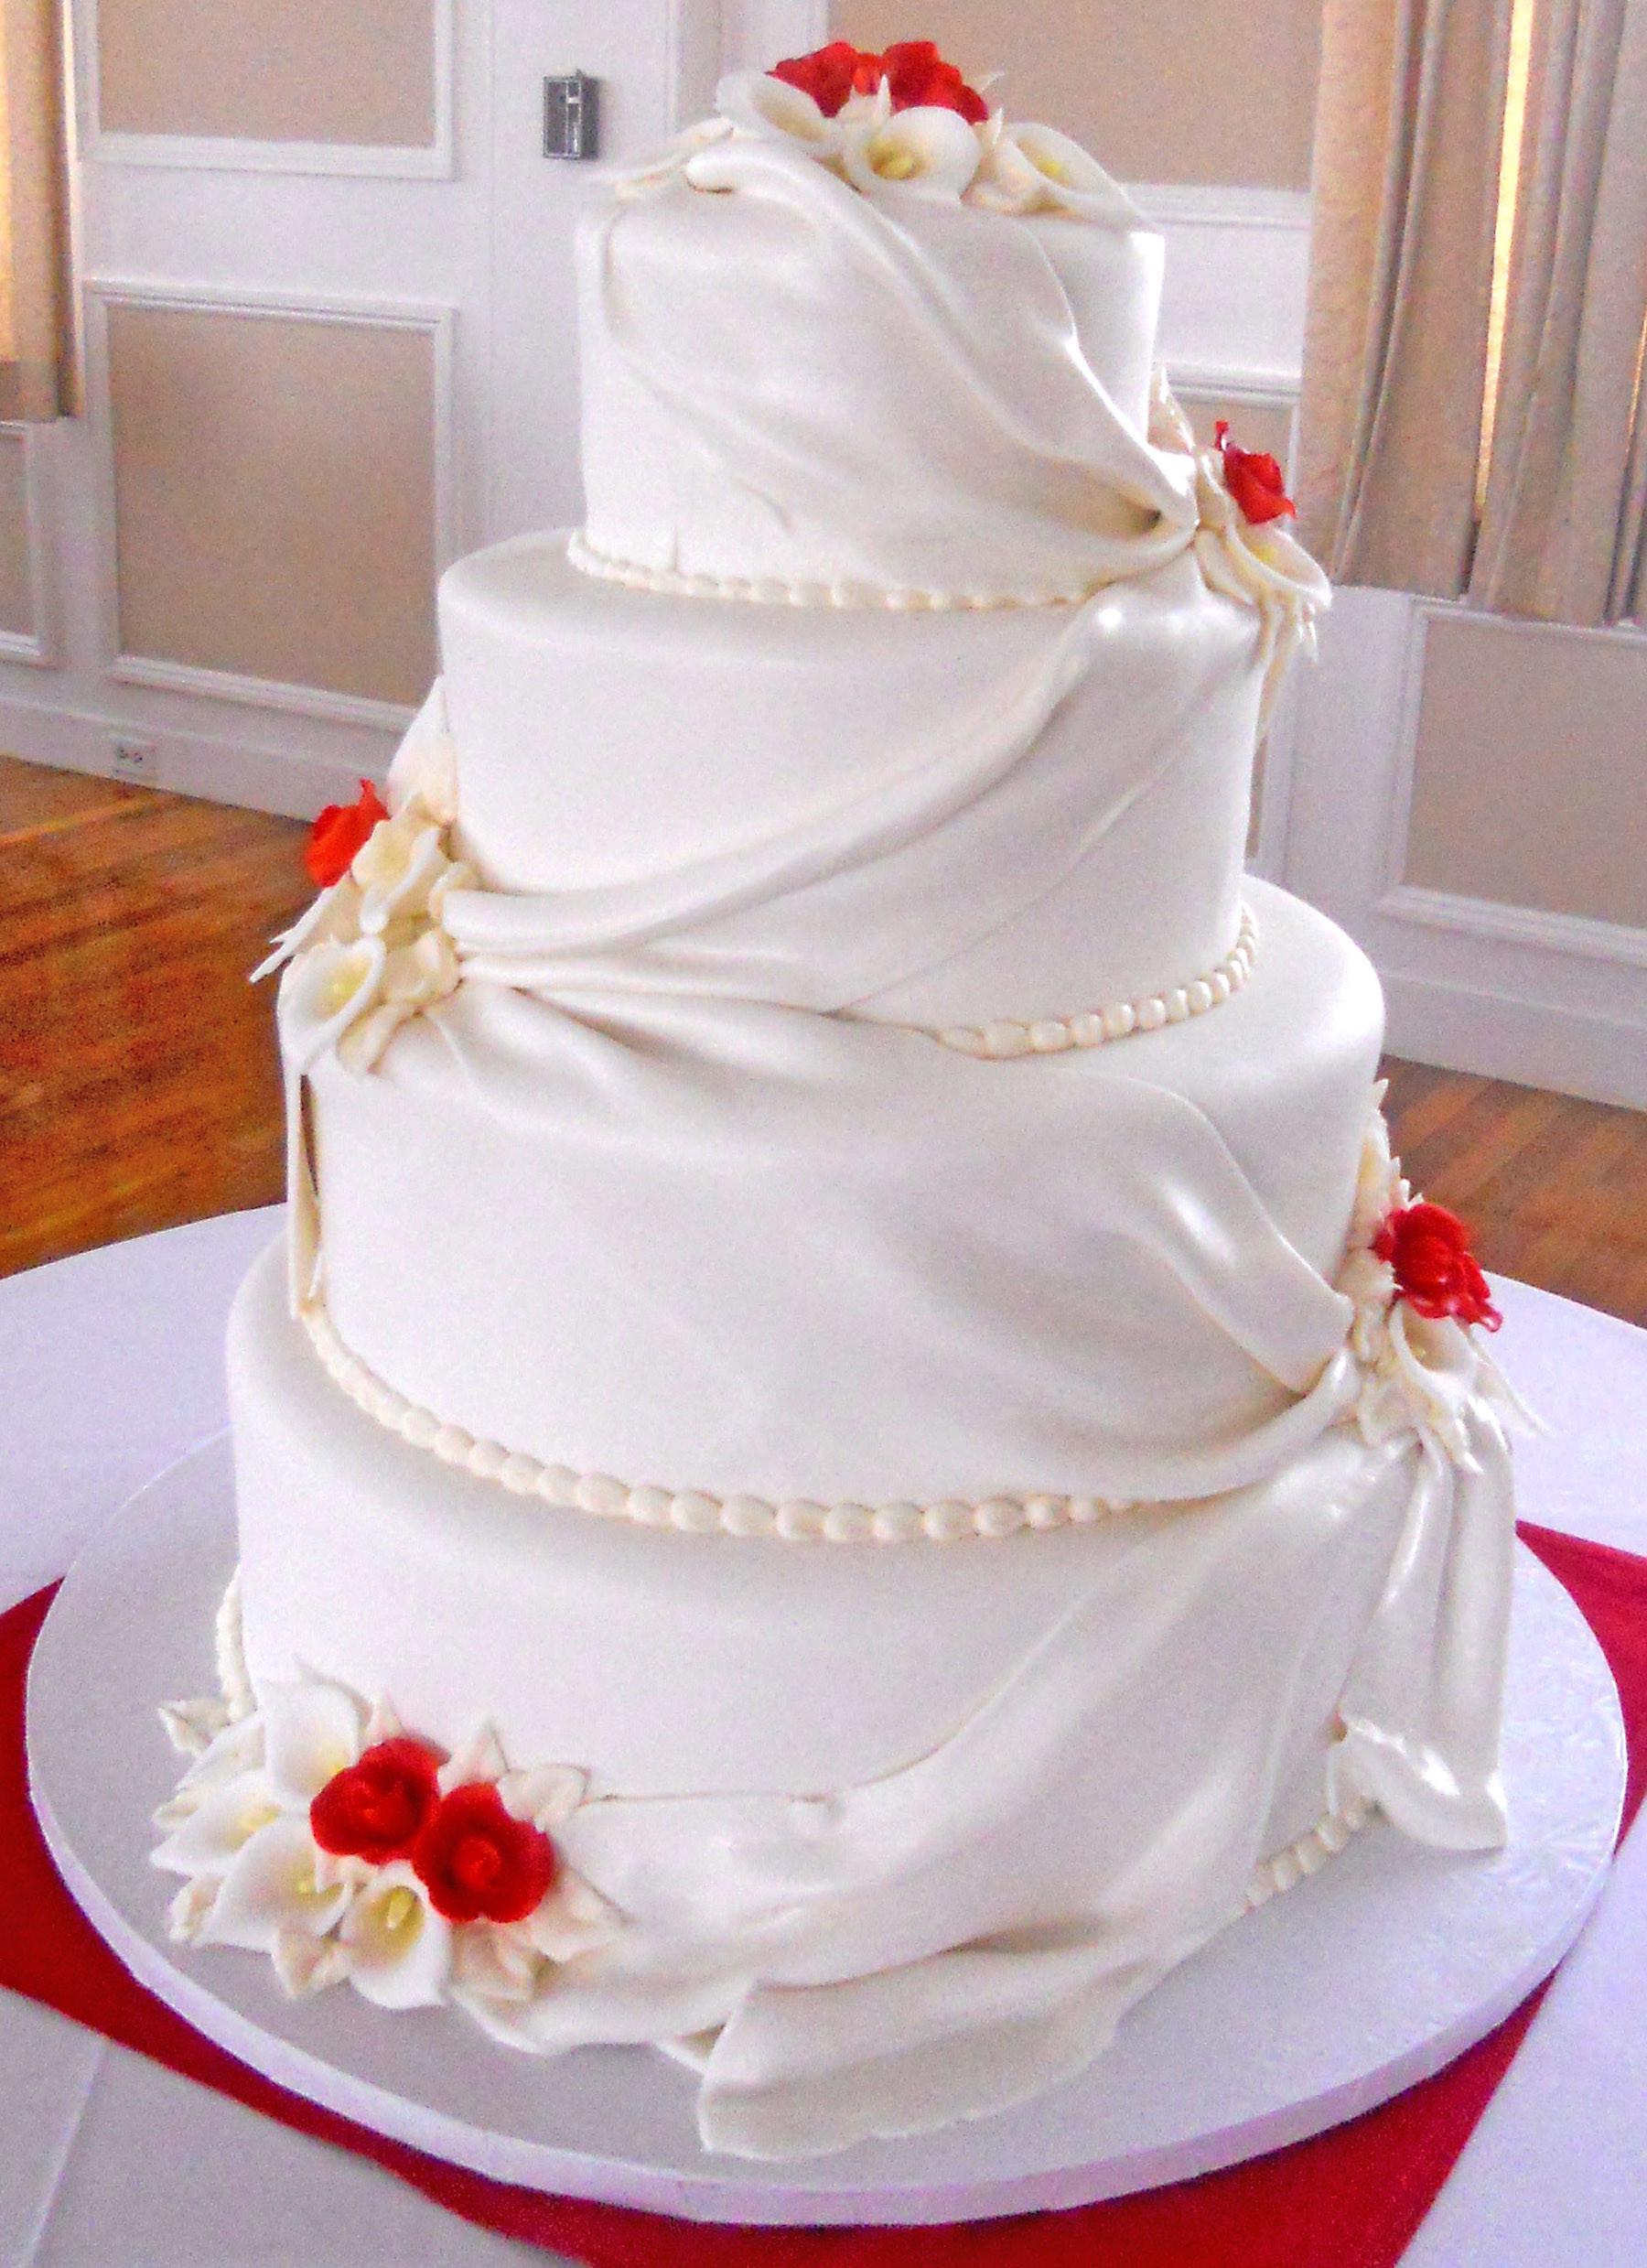 Wedding Cakes And Prices  Amazing Wedding Cakes for Amazing Events Registaz